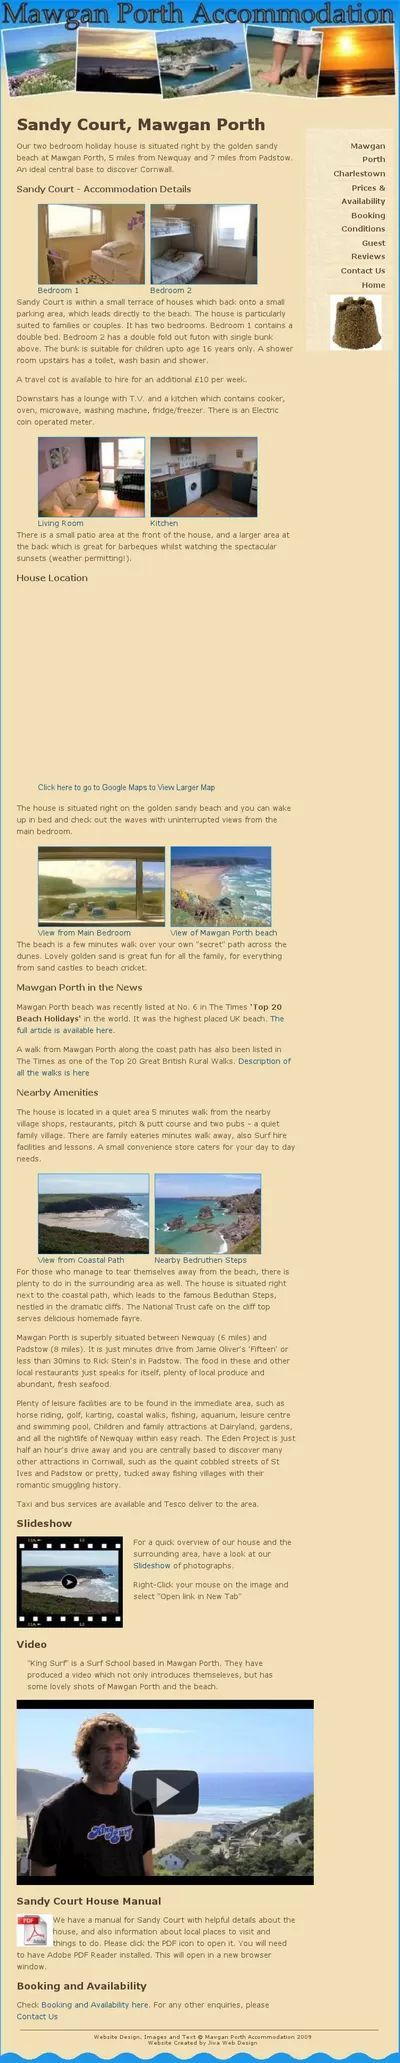 mawganporth - Google Search